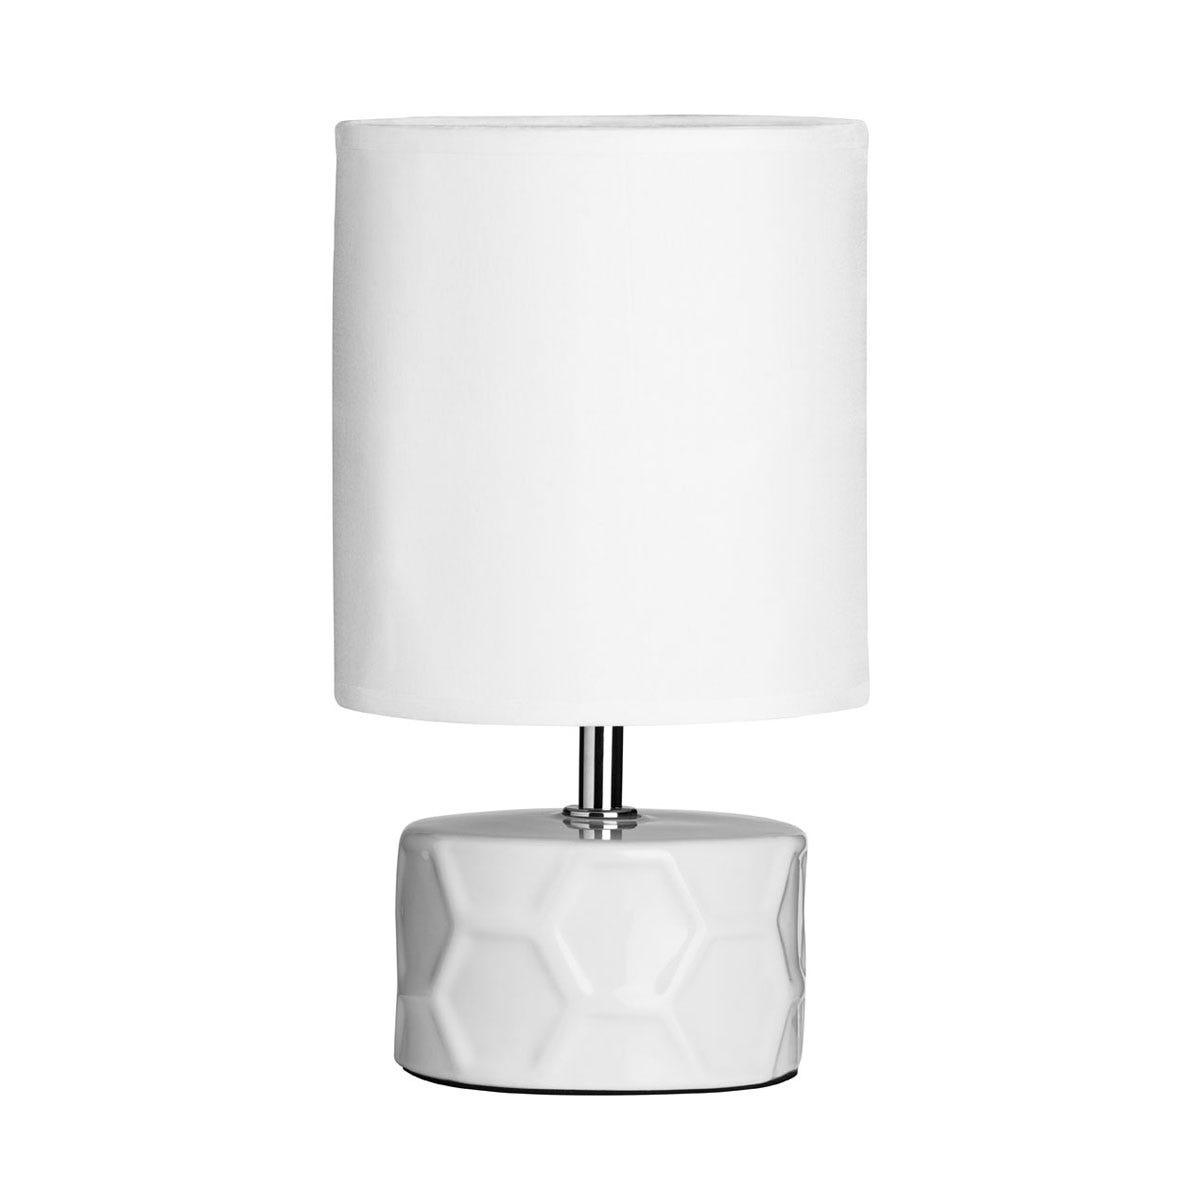 Premier Housewares Honeycomb Ceramic Base Table Lamp - White